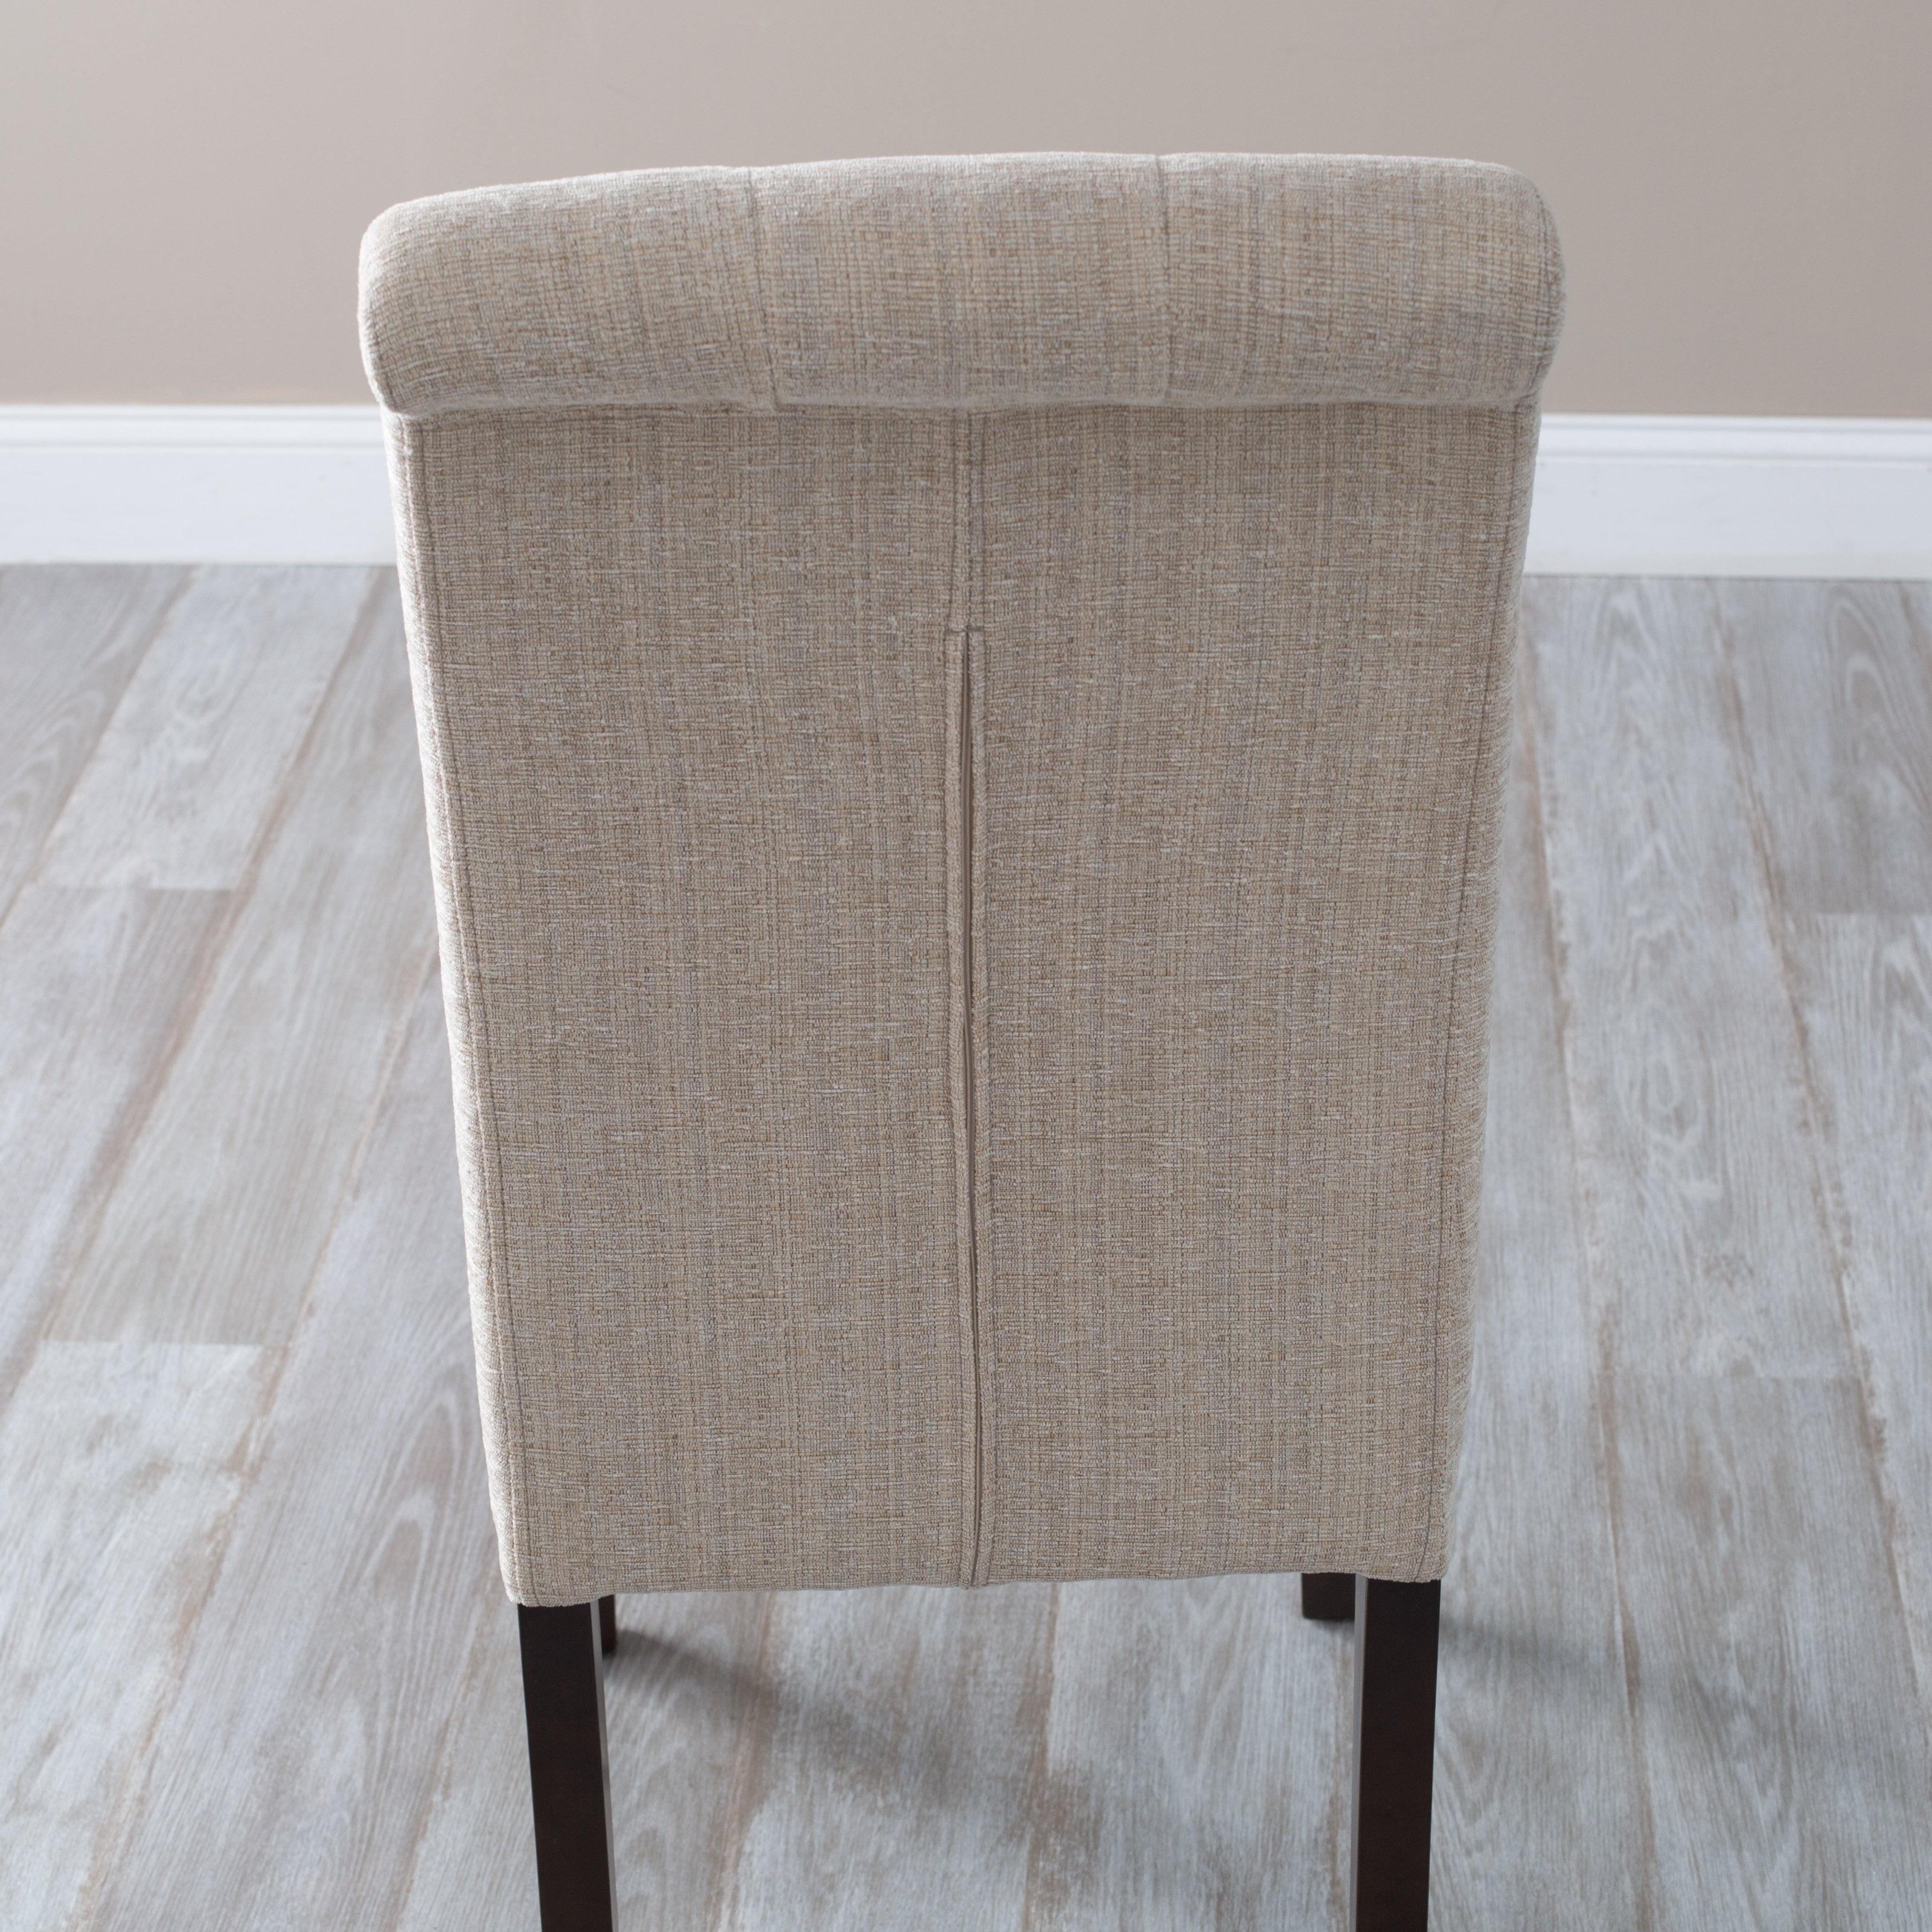 Tufted parsons chairs - Tufted Parsons Chairs 43